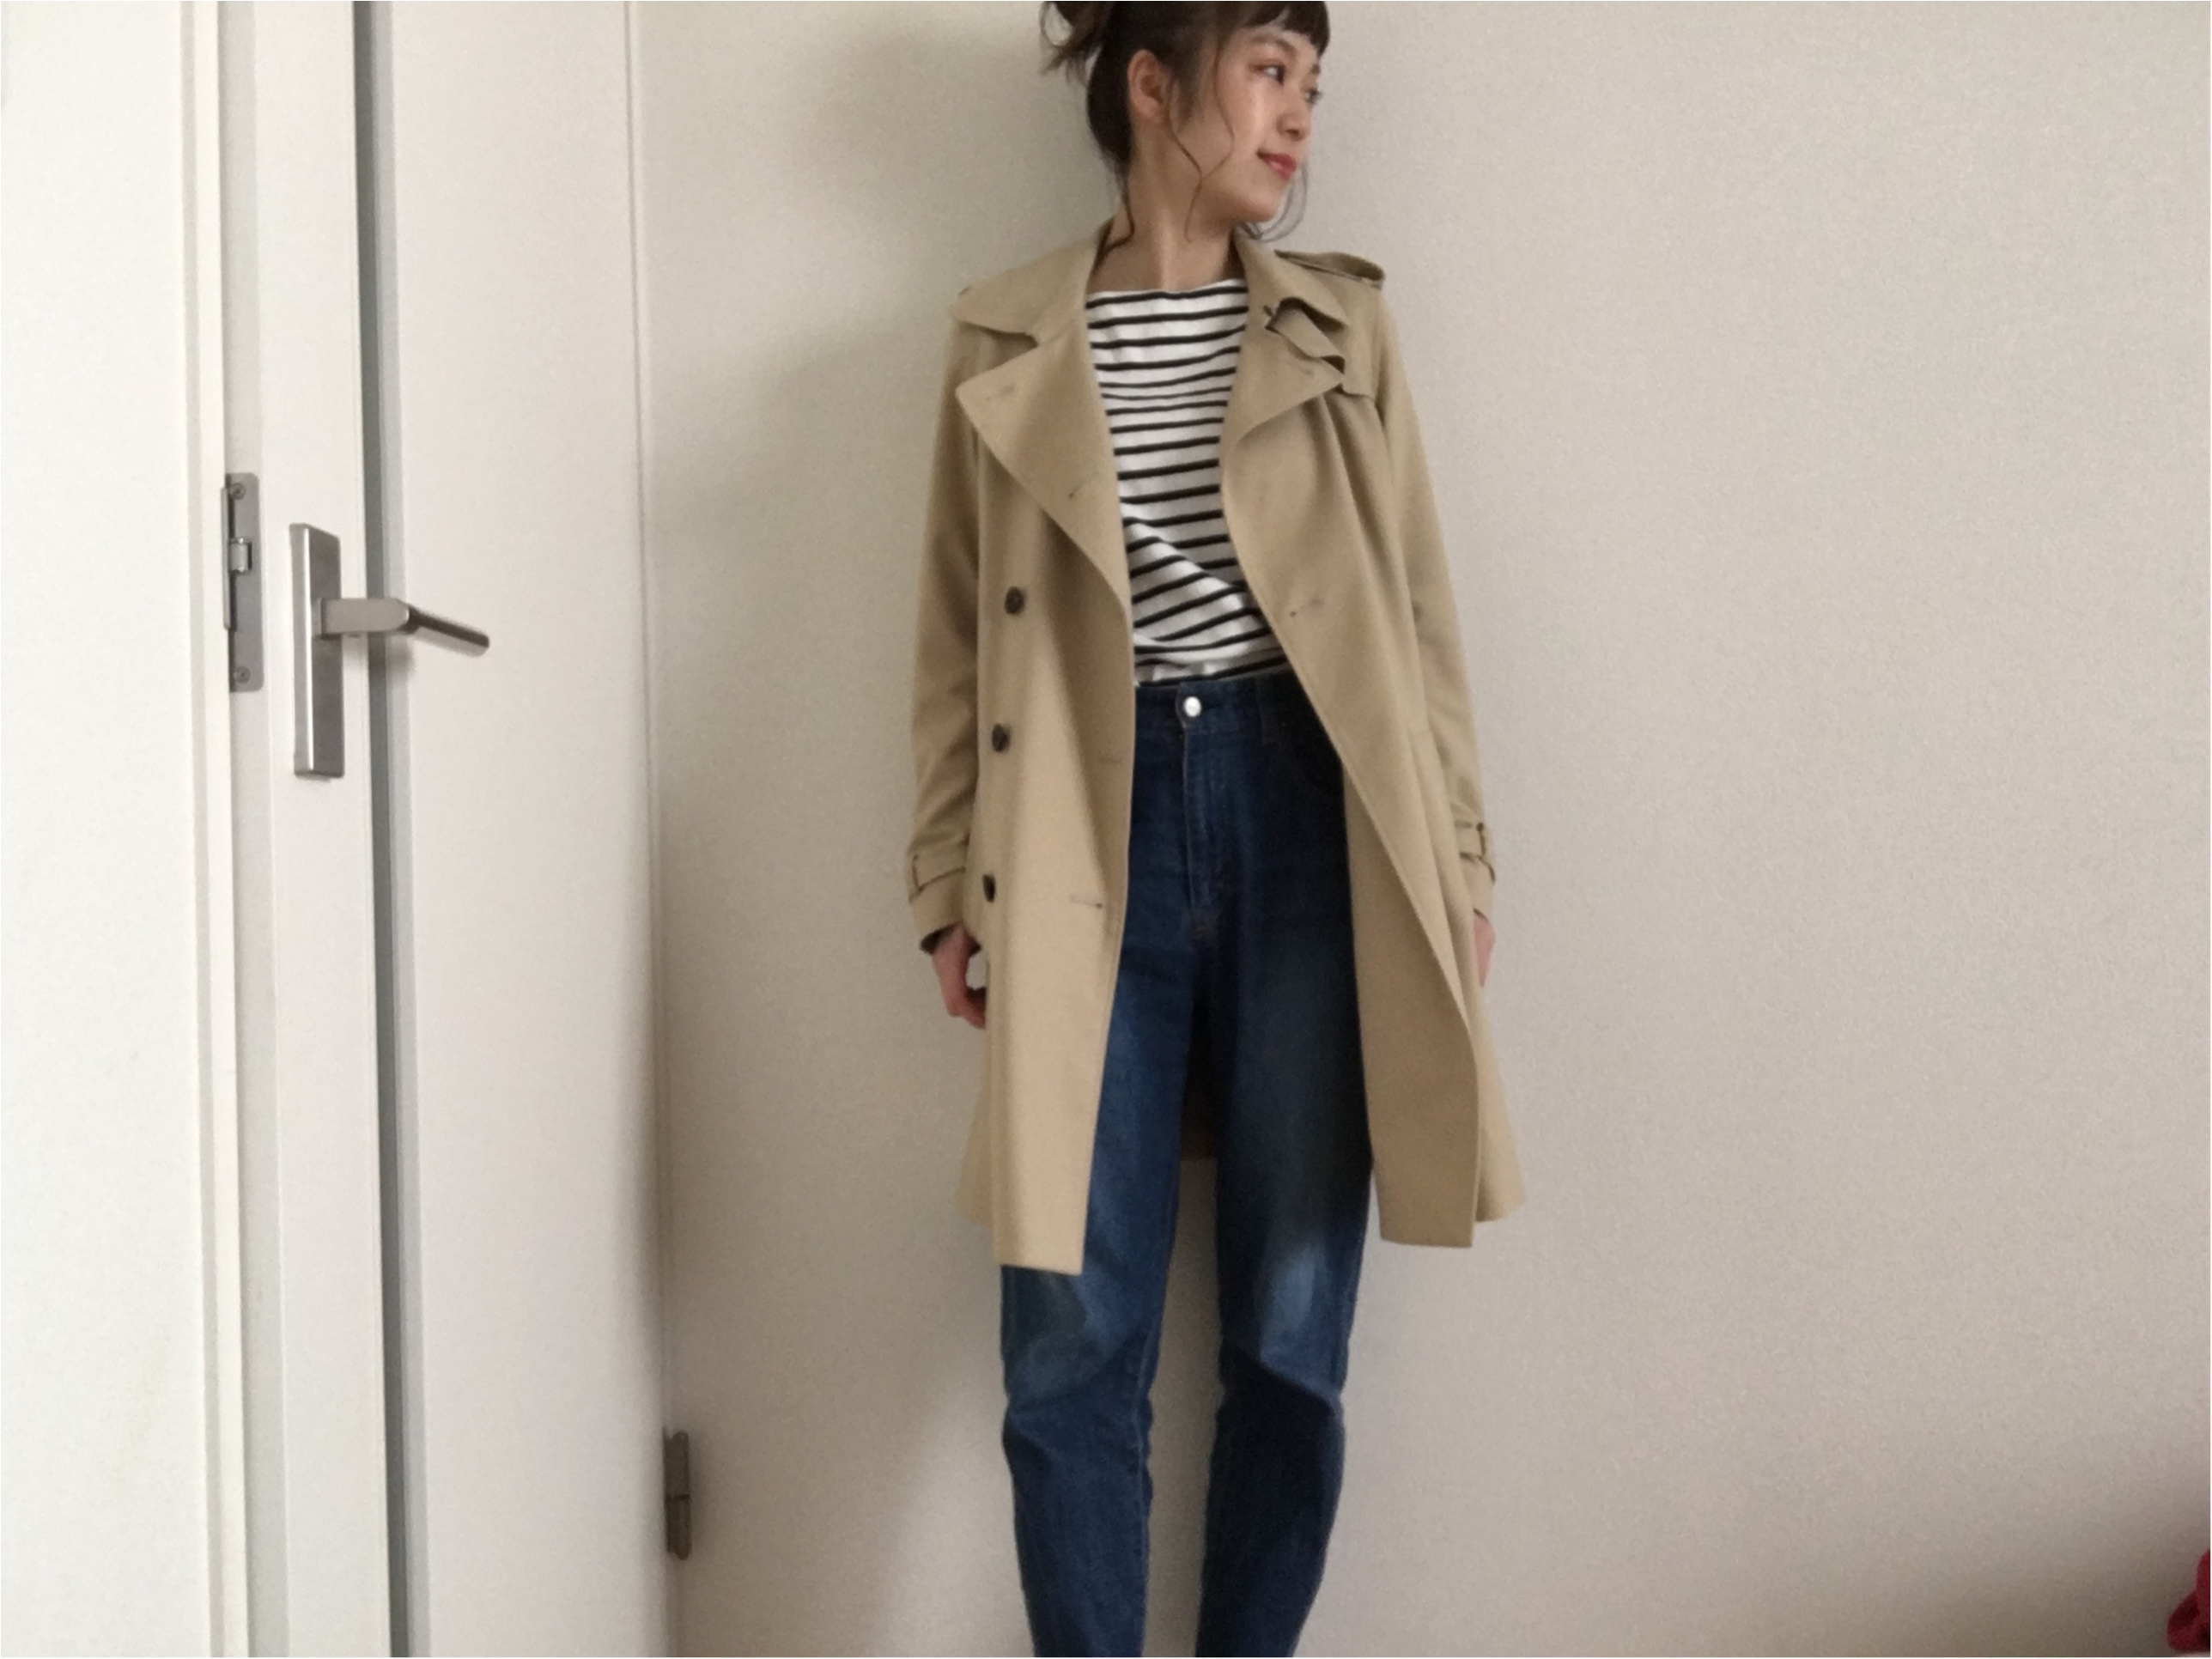 ★《ayachille code》7days fashion show!_4